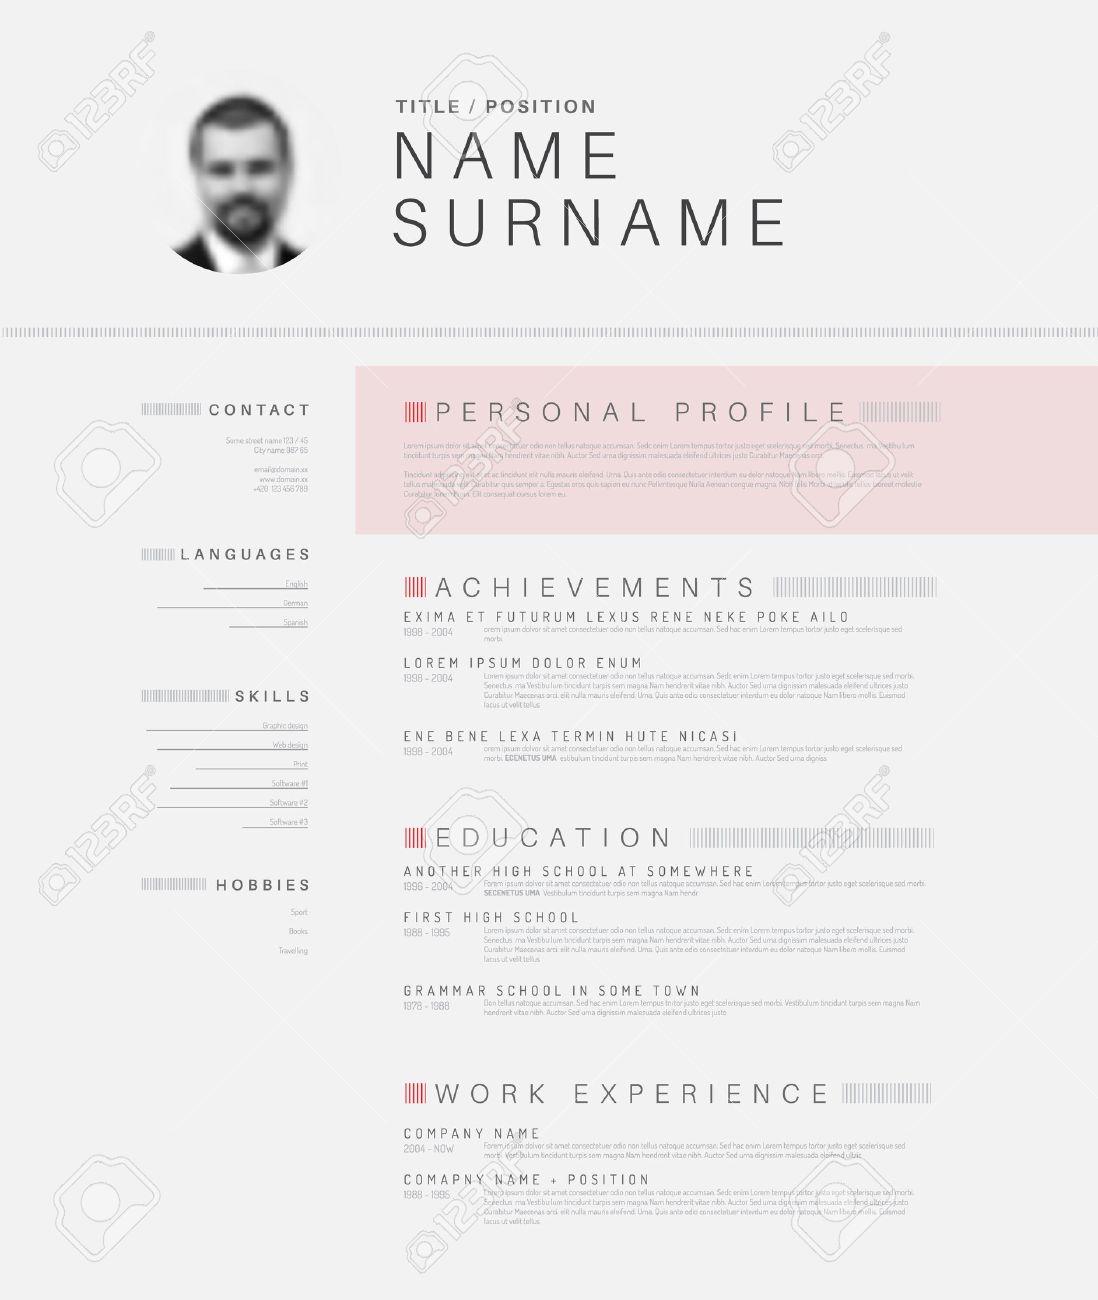 Vector minimalist black and white cv / resume template design with profile photo - 44870565